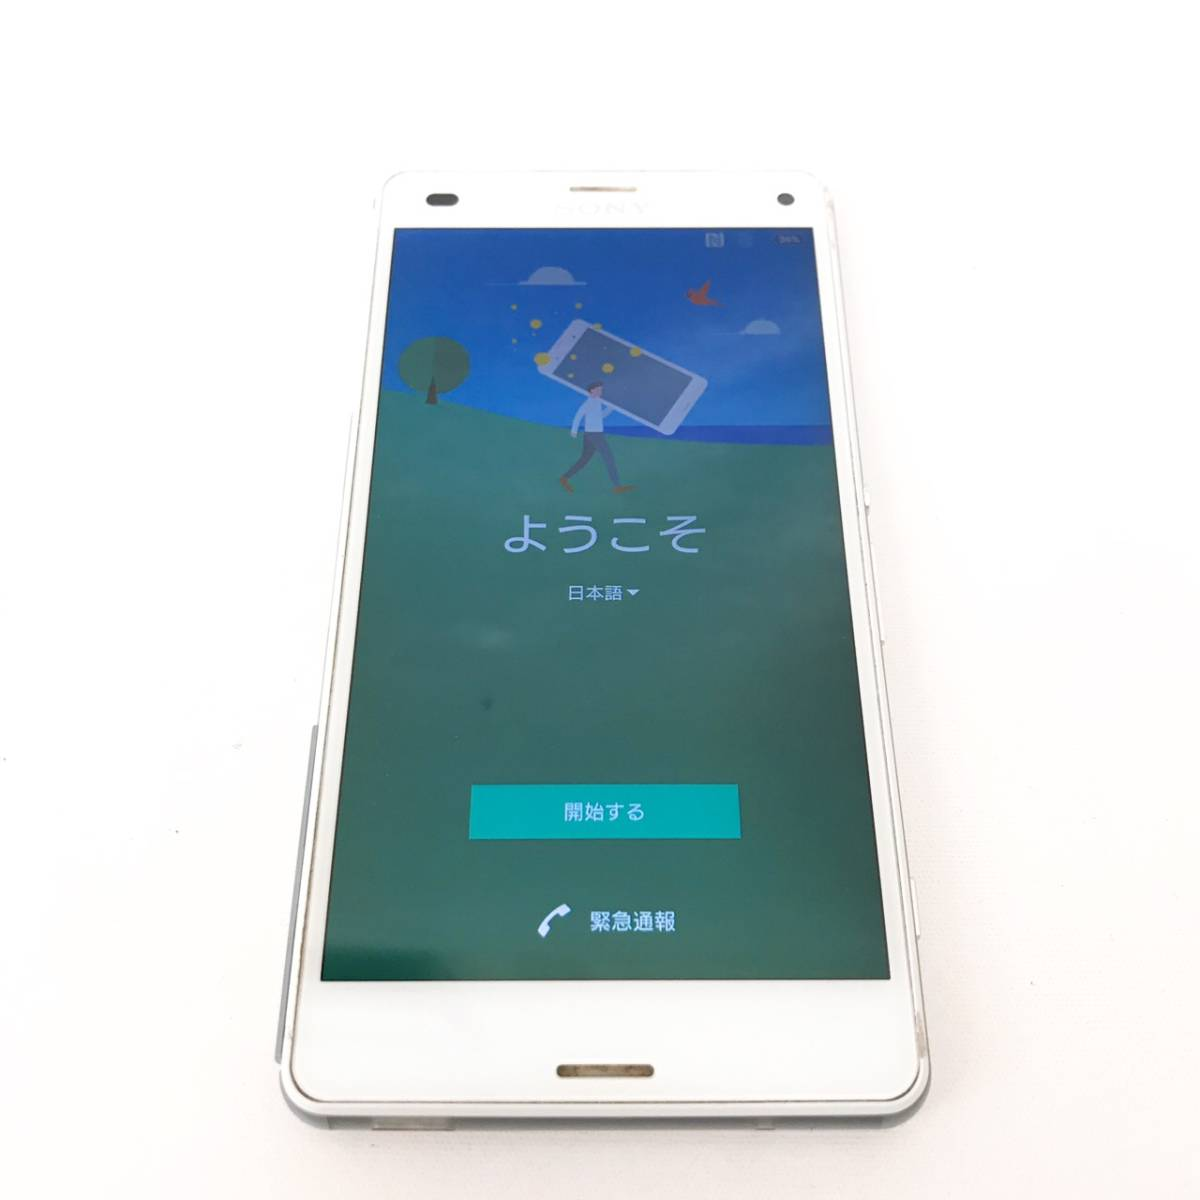 ★SONY XPERIA Z3 COMPACT SO-02G docomo ネットワーク利用制限〇★ドコモ/16GB/ソニー/エクスペリア/Z3 Compact/SO-02G/CD0